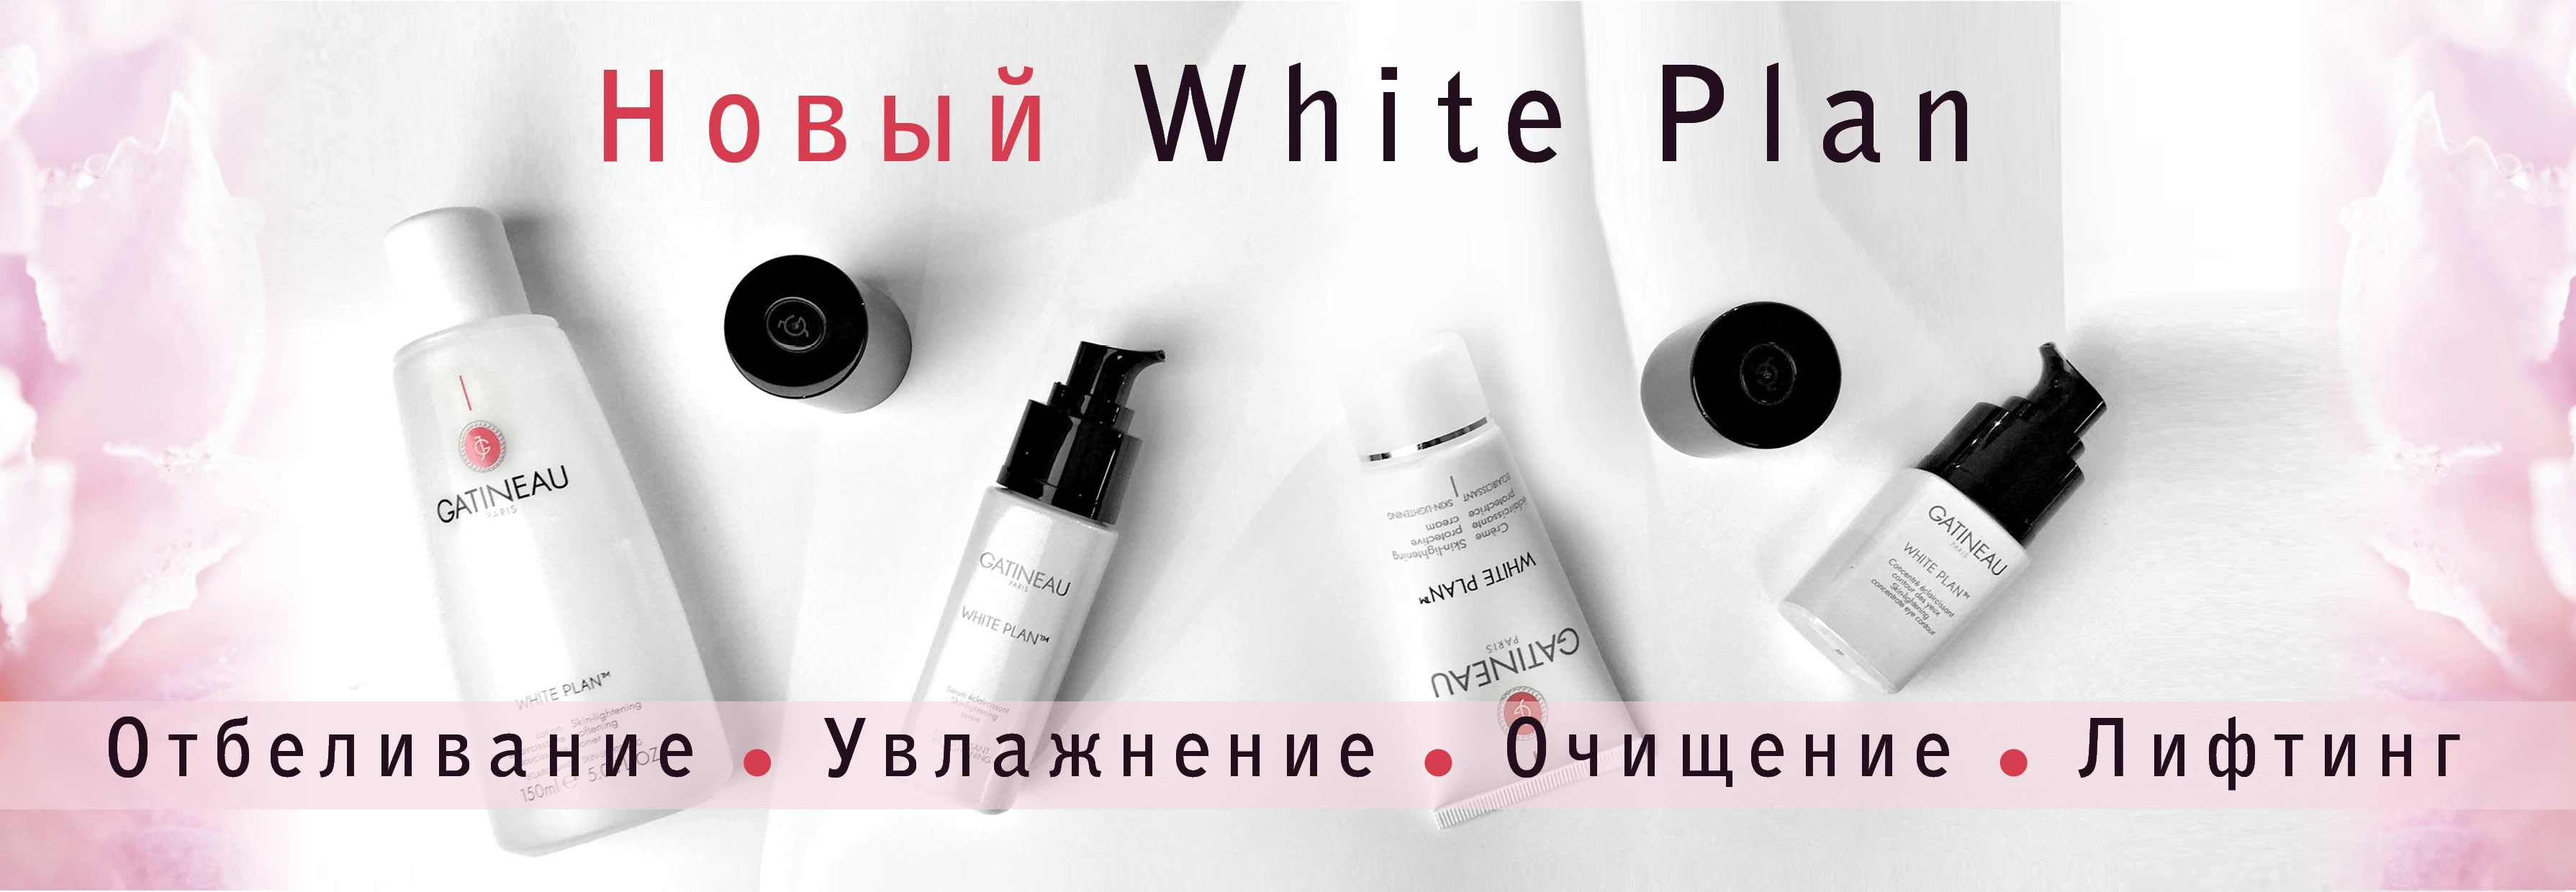 White plan